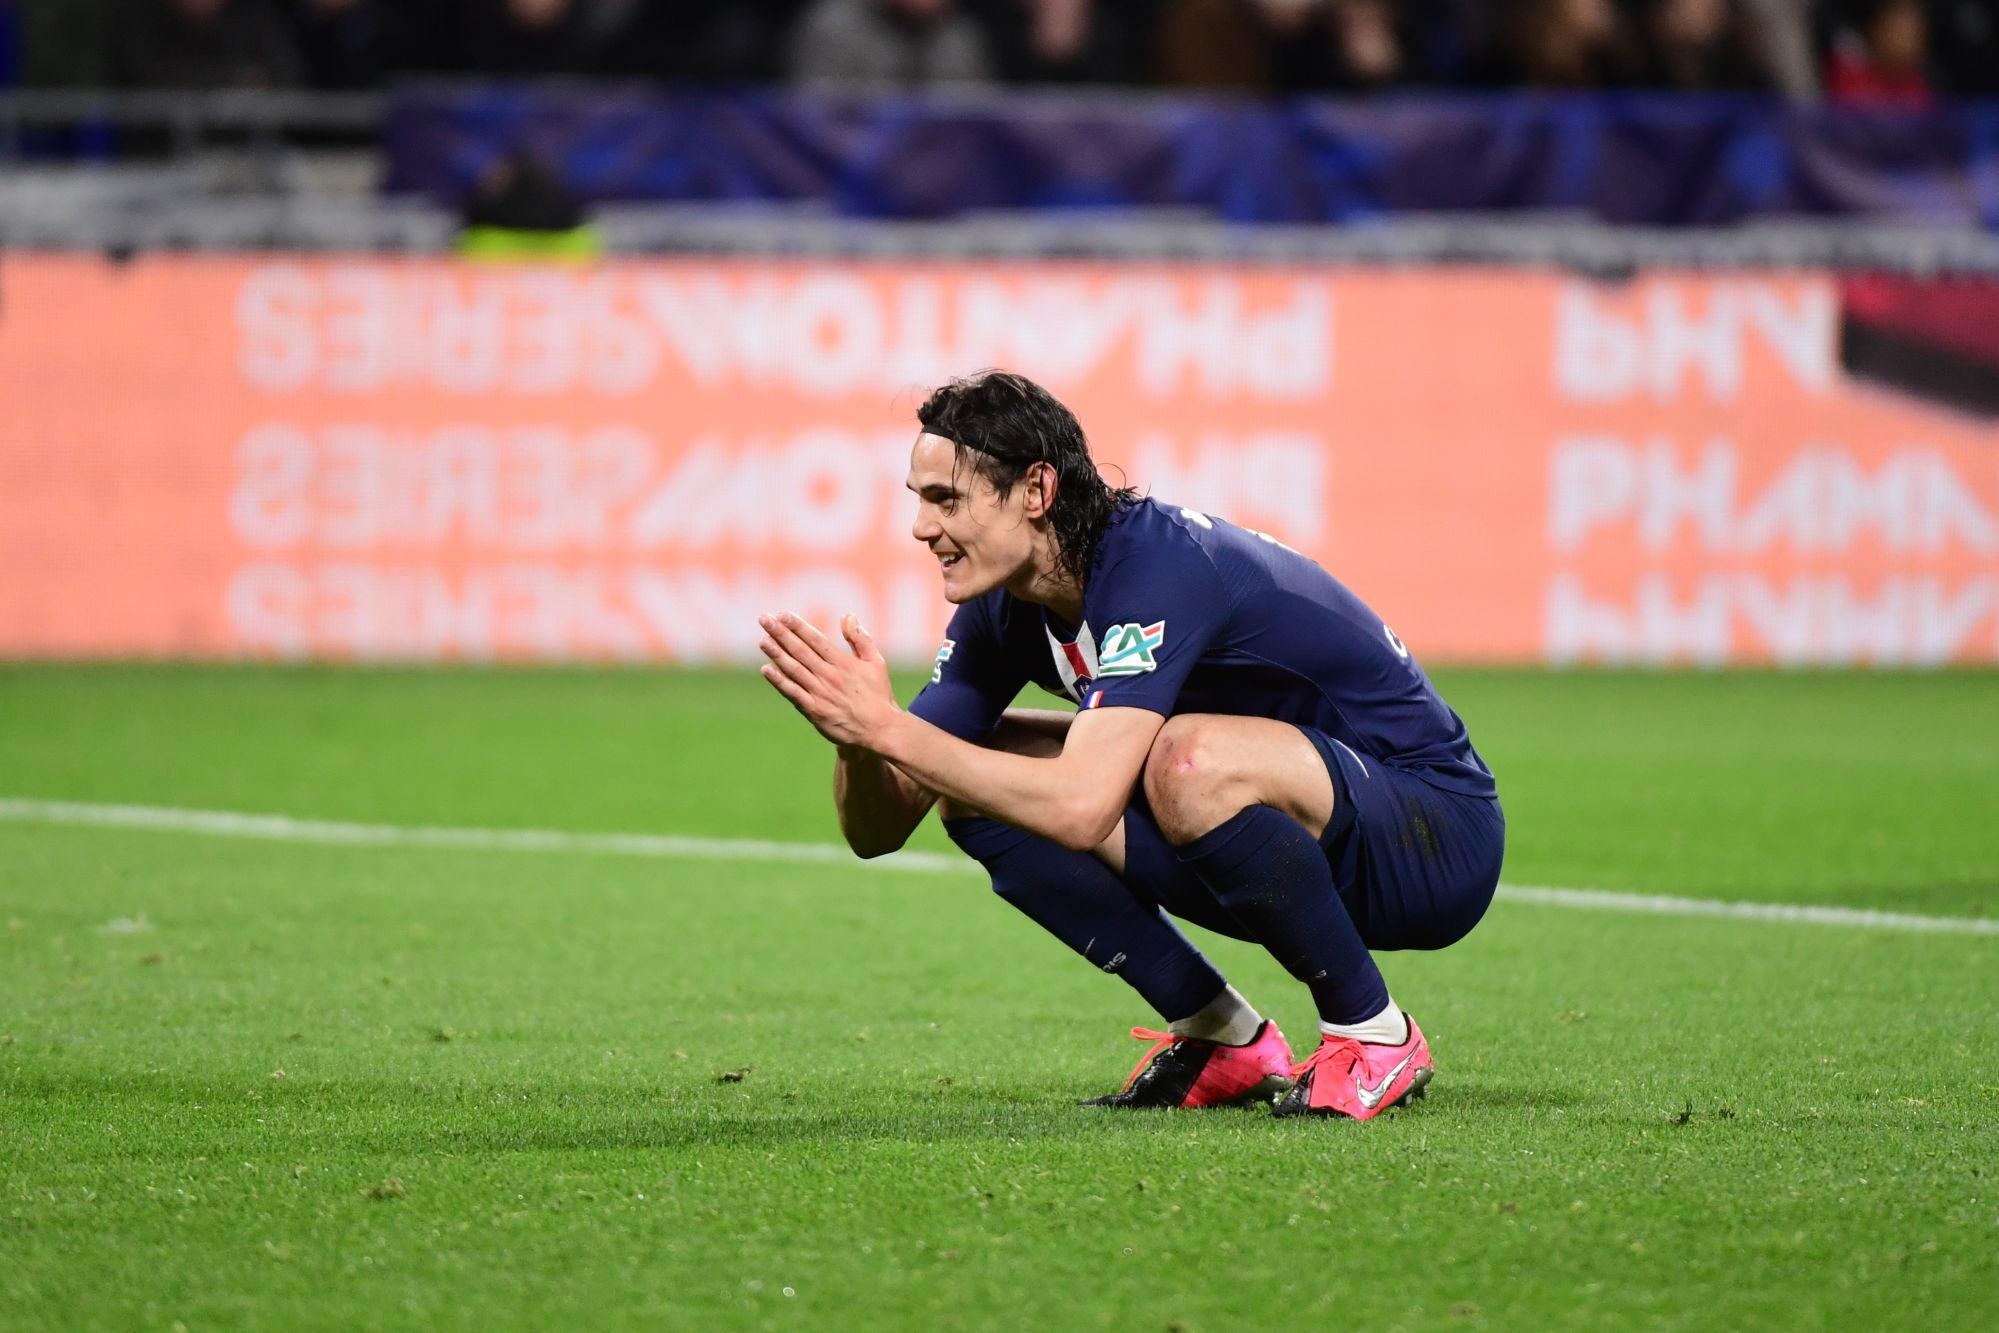 Mercato - Cavani n'ira finalement pas au Benfica, selon Record